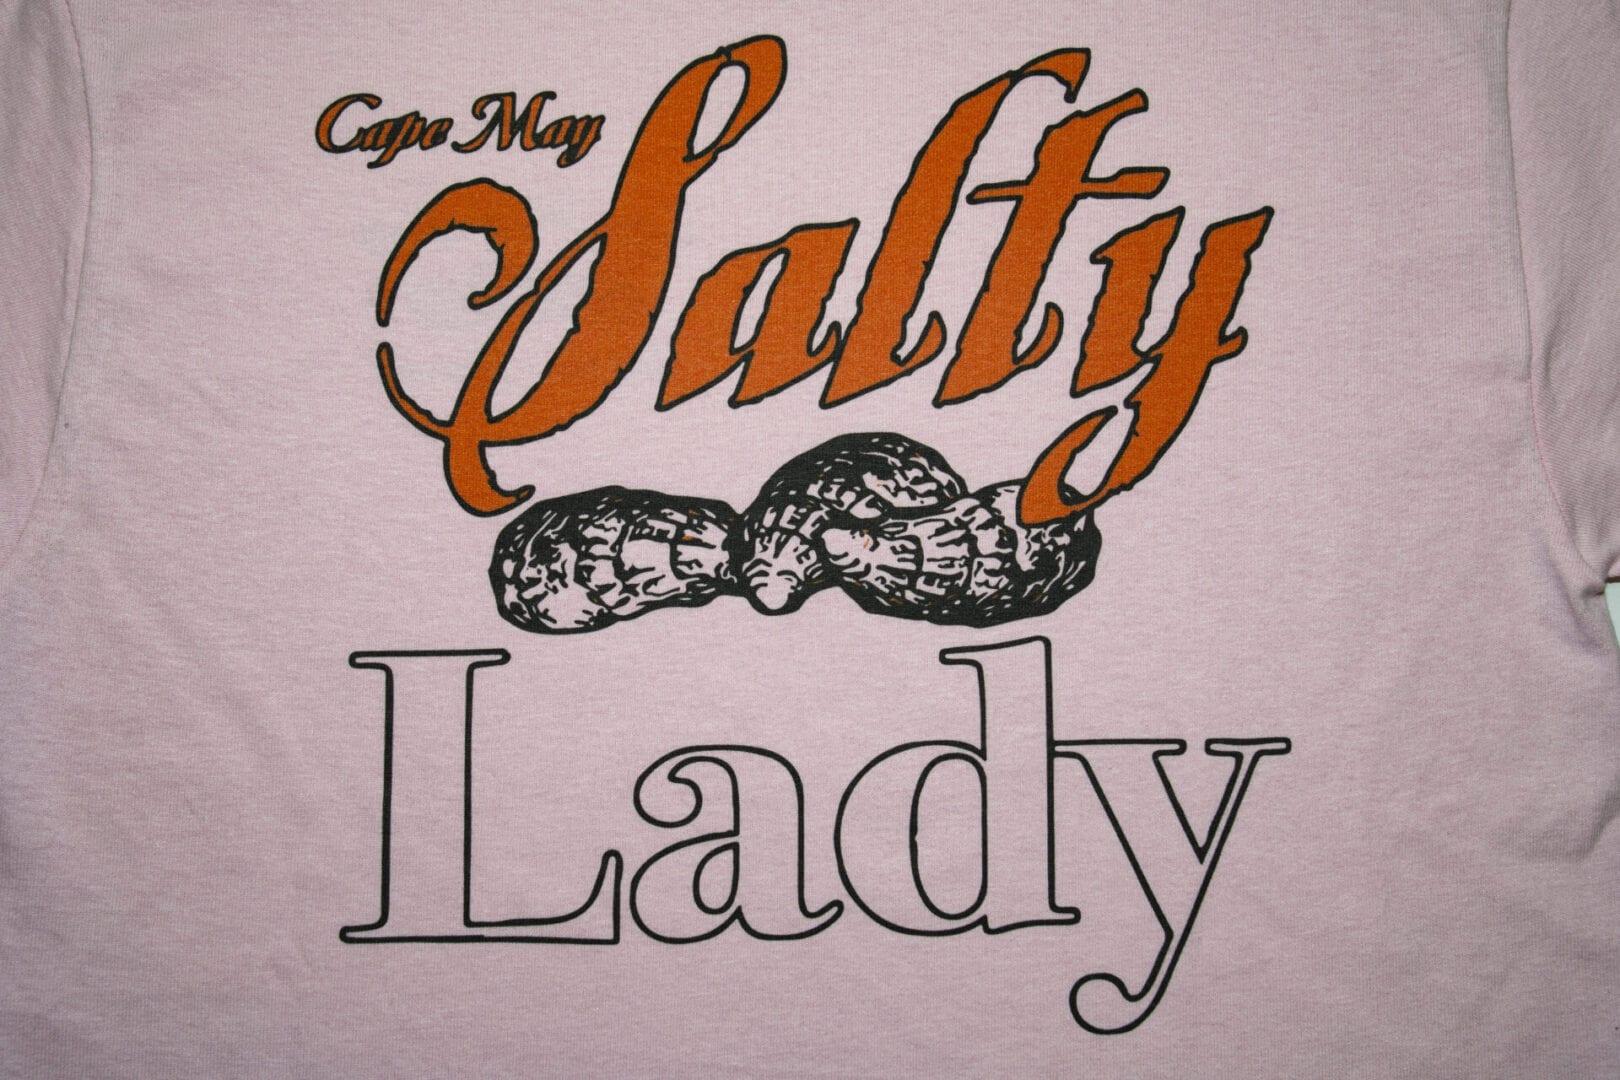 Salty lady